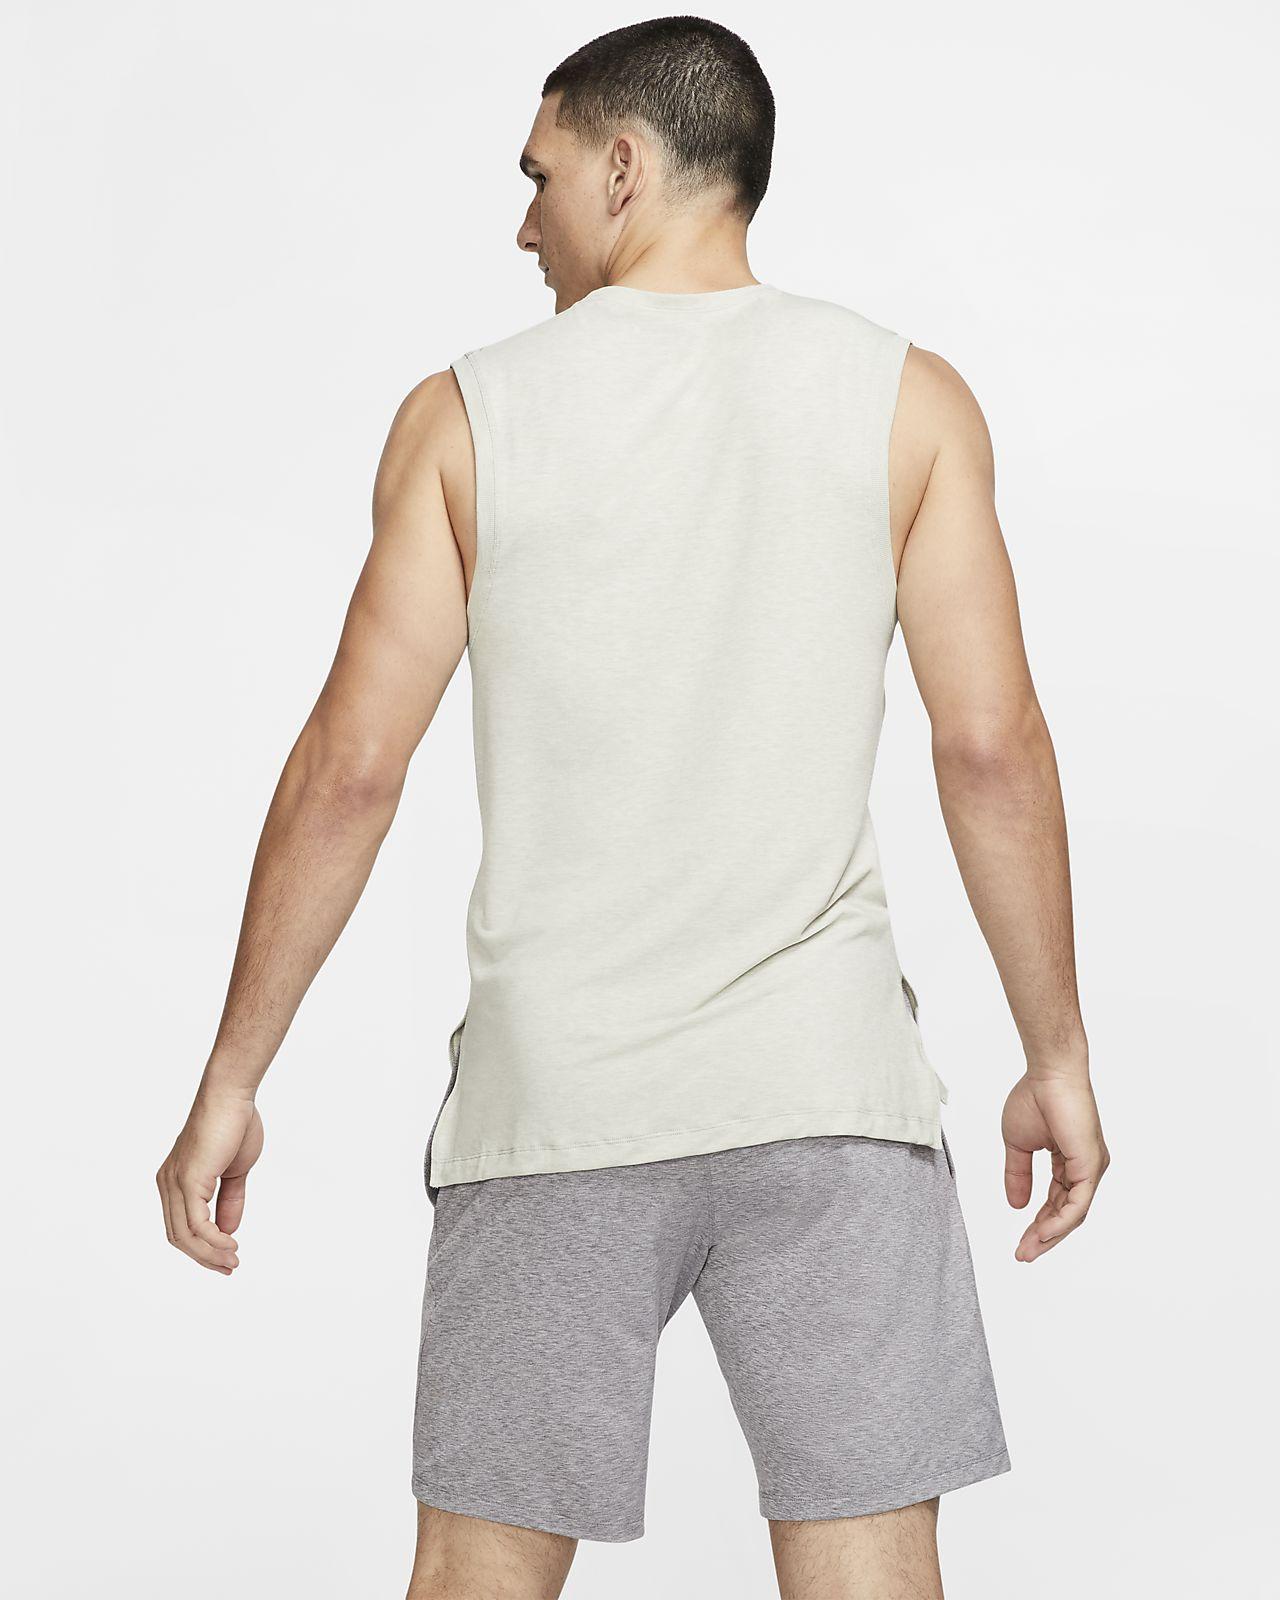 be5a2ad032844 Nike Dri-FIT Men s Yoga Training Tank. Nike.com CA